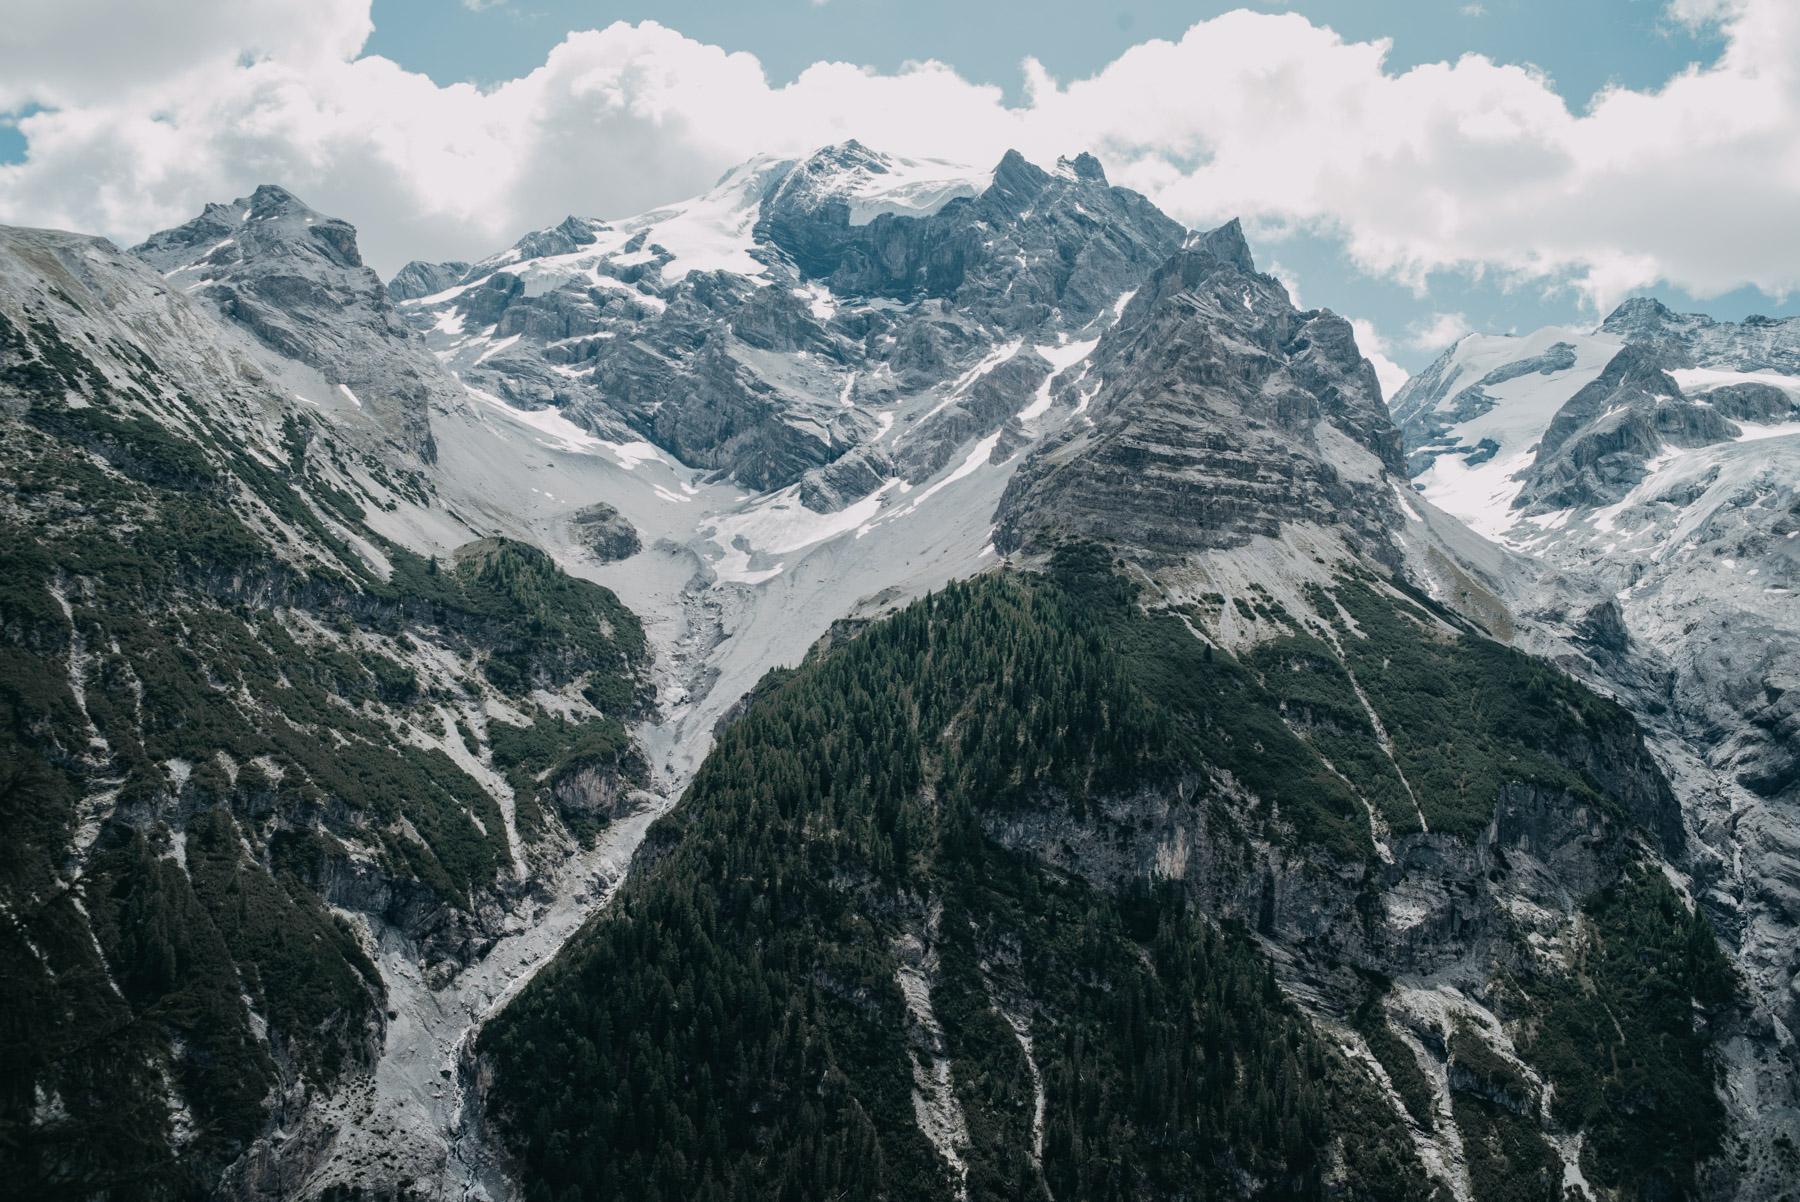 Montagne vicino al passo dello Stelvio in estate, the mountains in the region of Stelvio pass during summer time